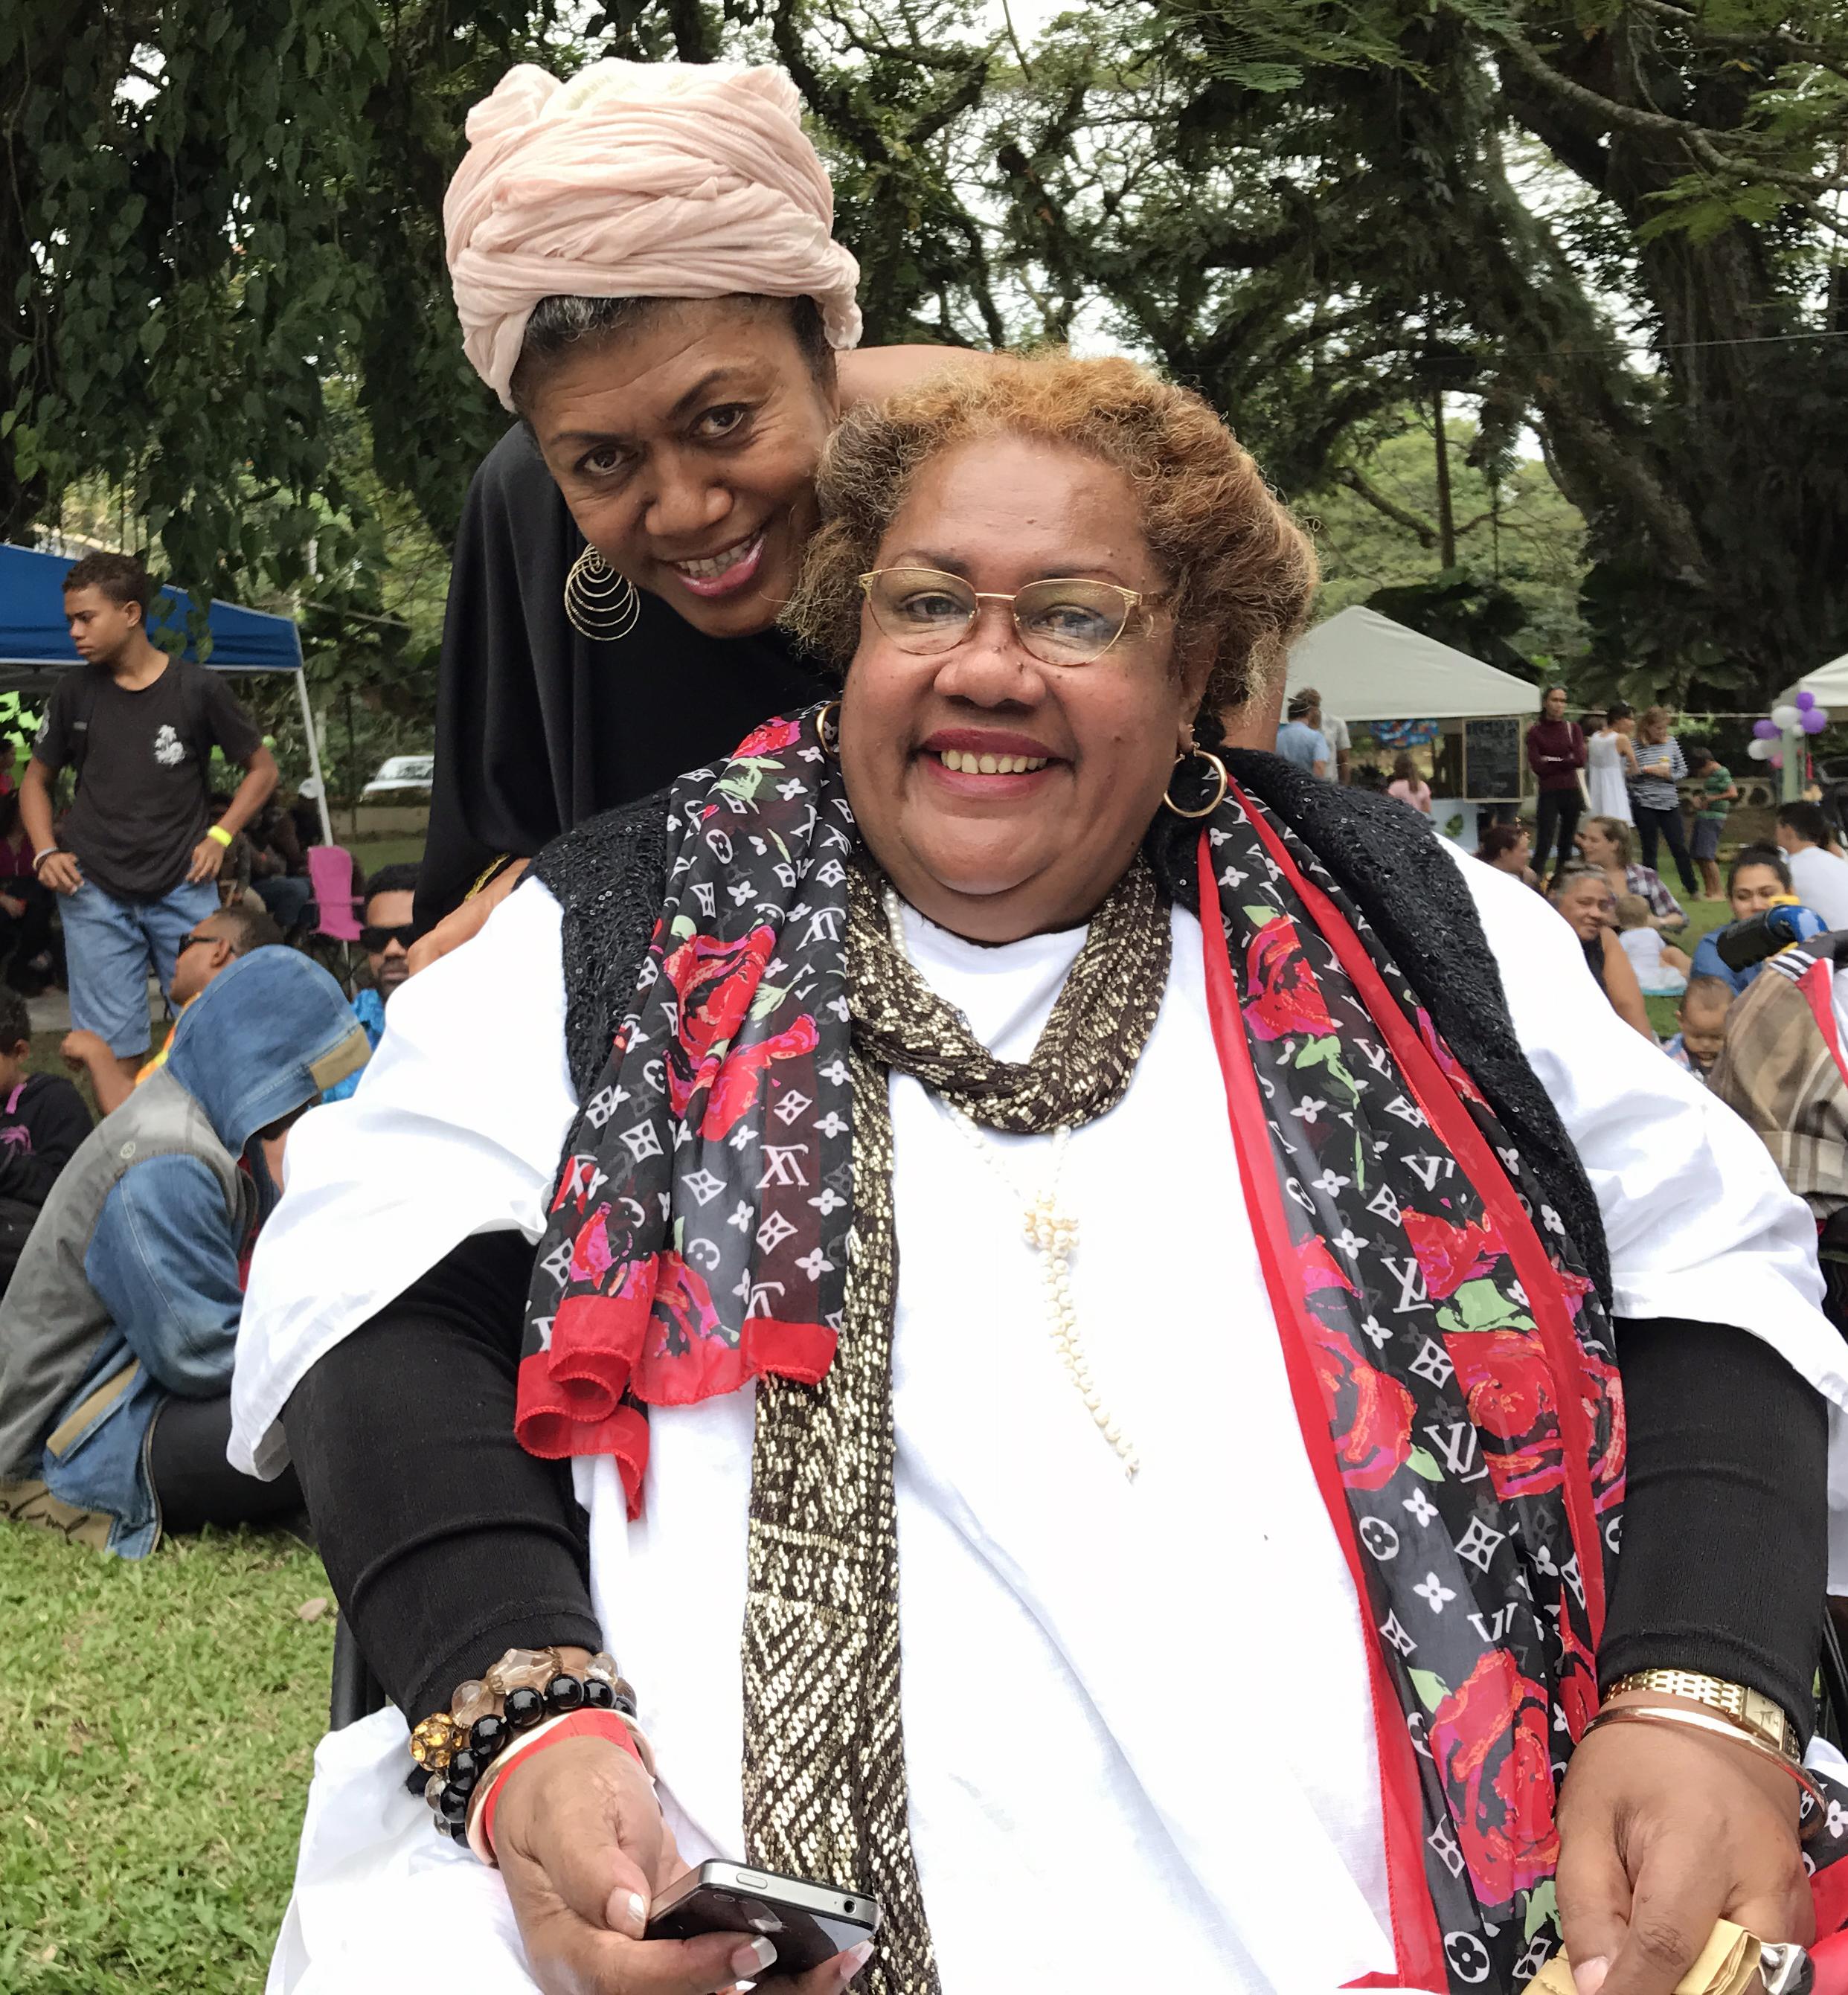 Senimili Toko with Vude Queen Laisa Vulakoro at the Thurston garden food and music festival on July 15, 2017.Photo:Vilimoni Vaganalau.